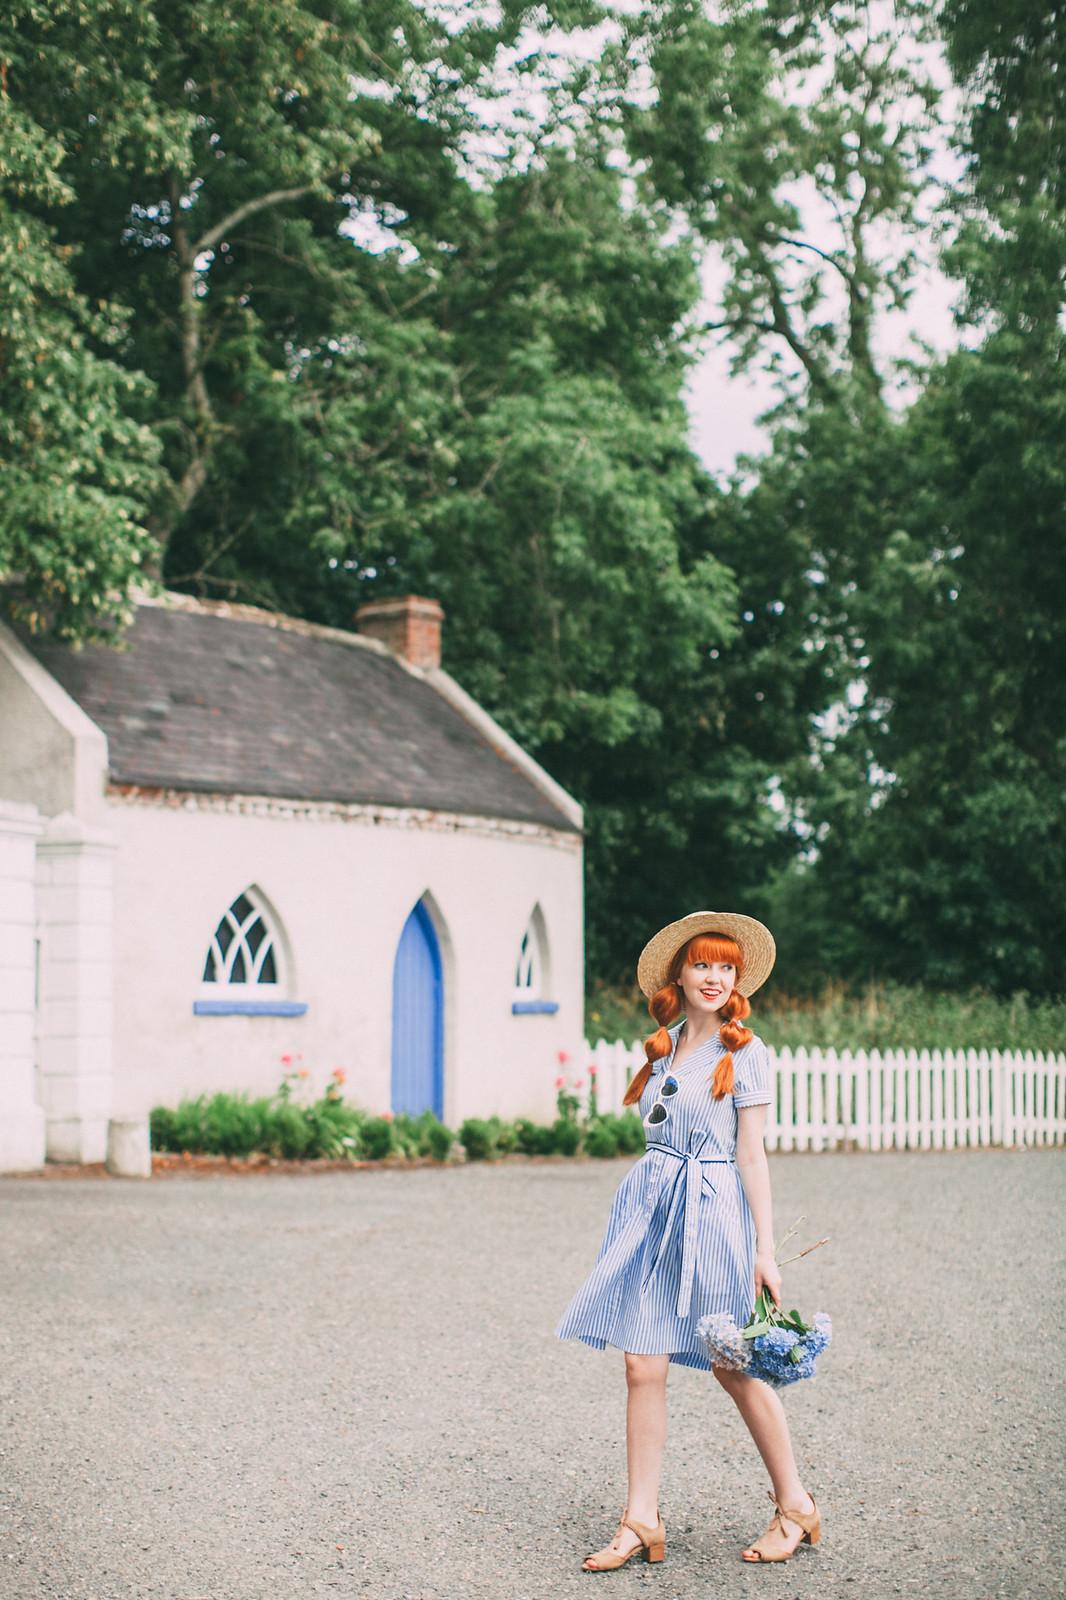 summerisland gatehouses-7